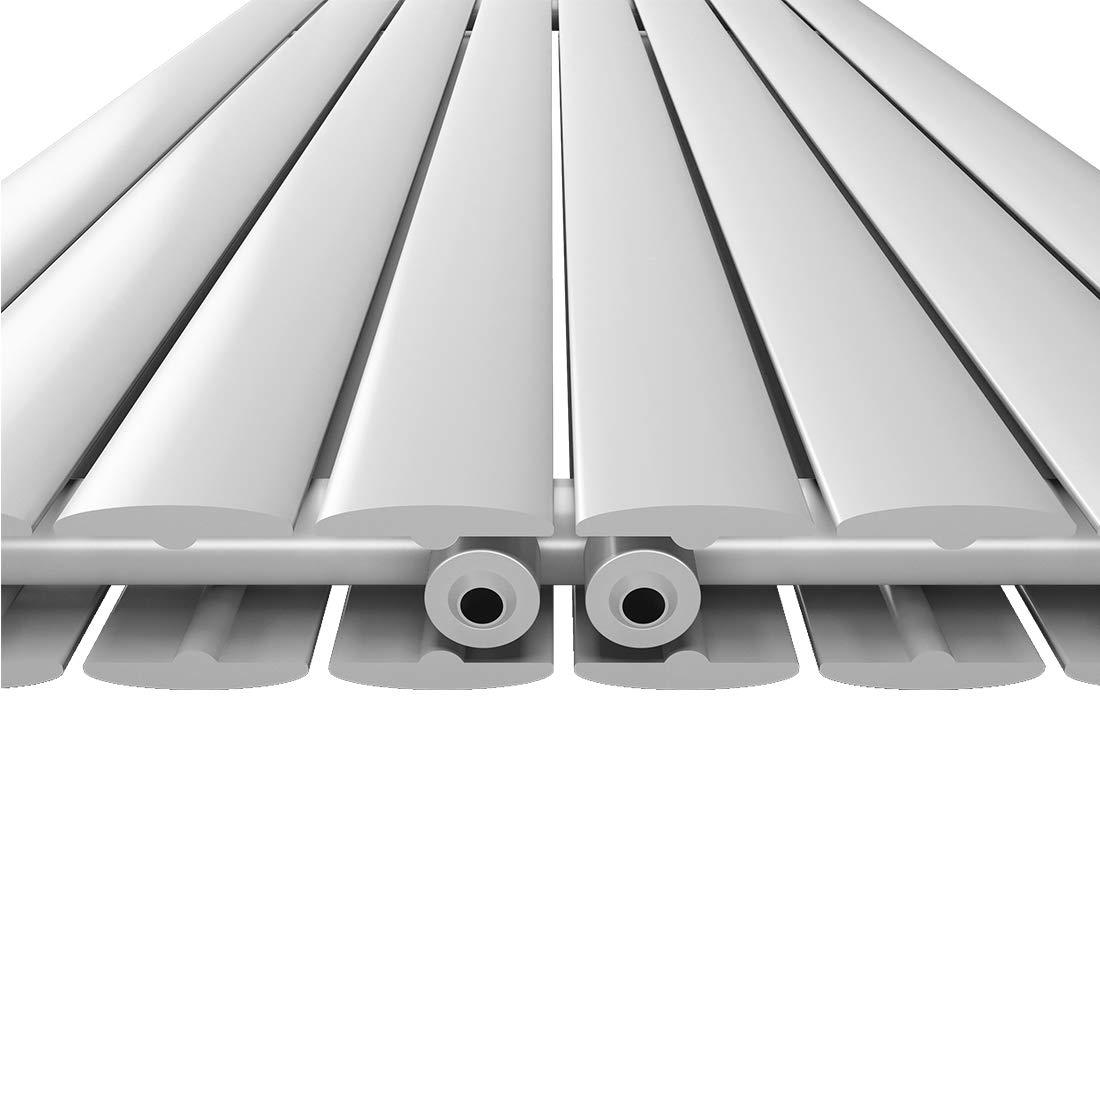 2036W Vertikal Heizk/örper Design Paneelheizk/örper 1600x620mm Wei/ß flach Doppellagig Mittelanschluss Heizung